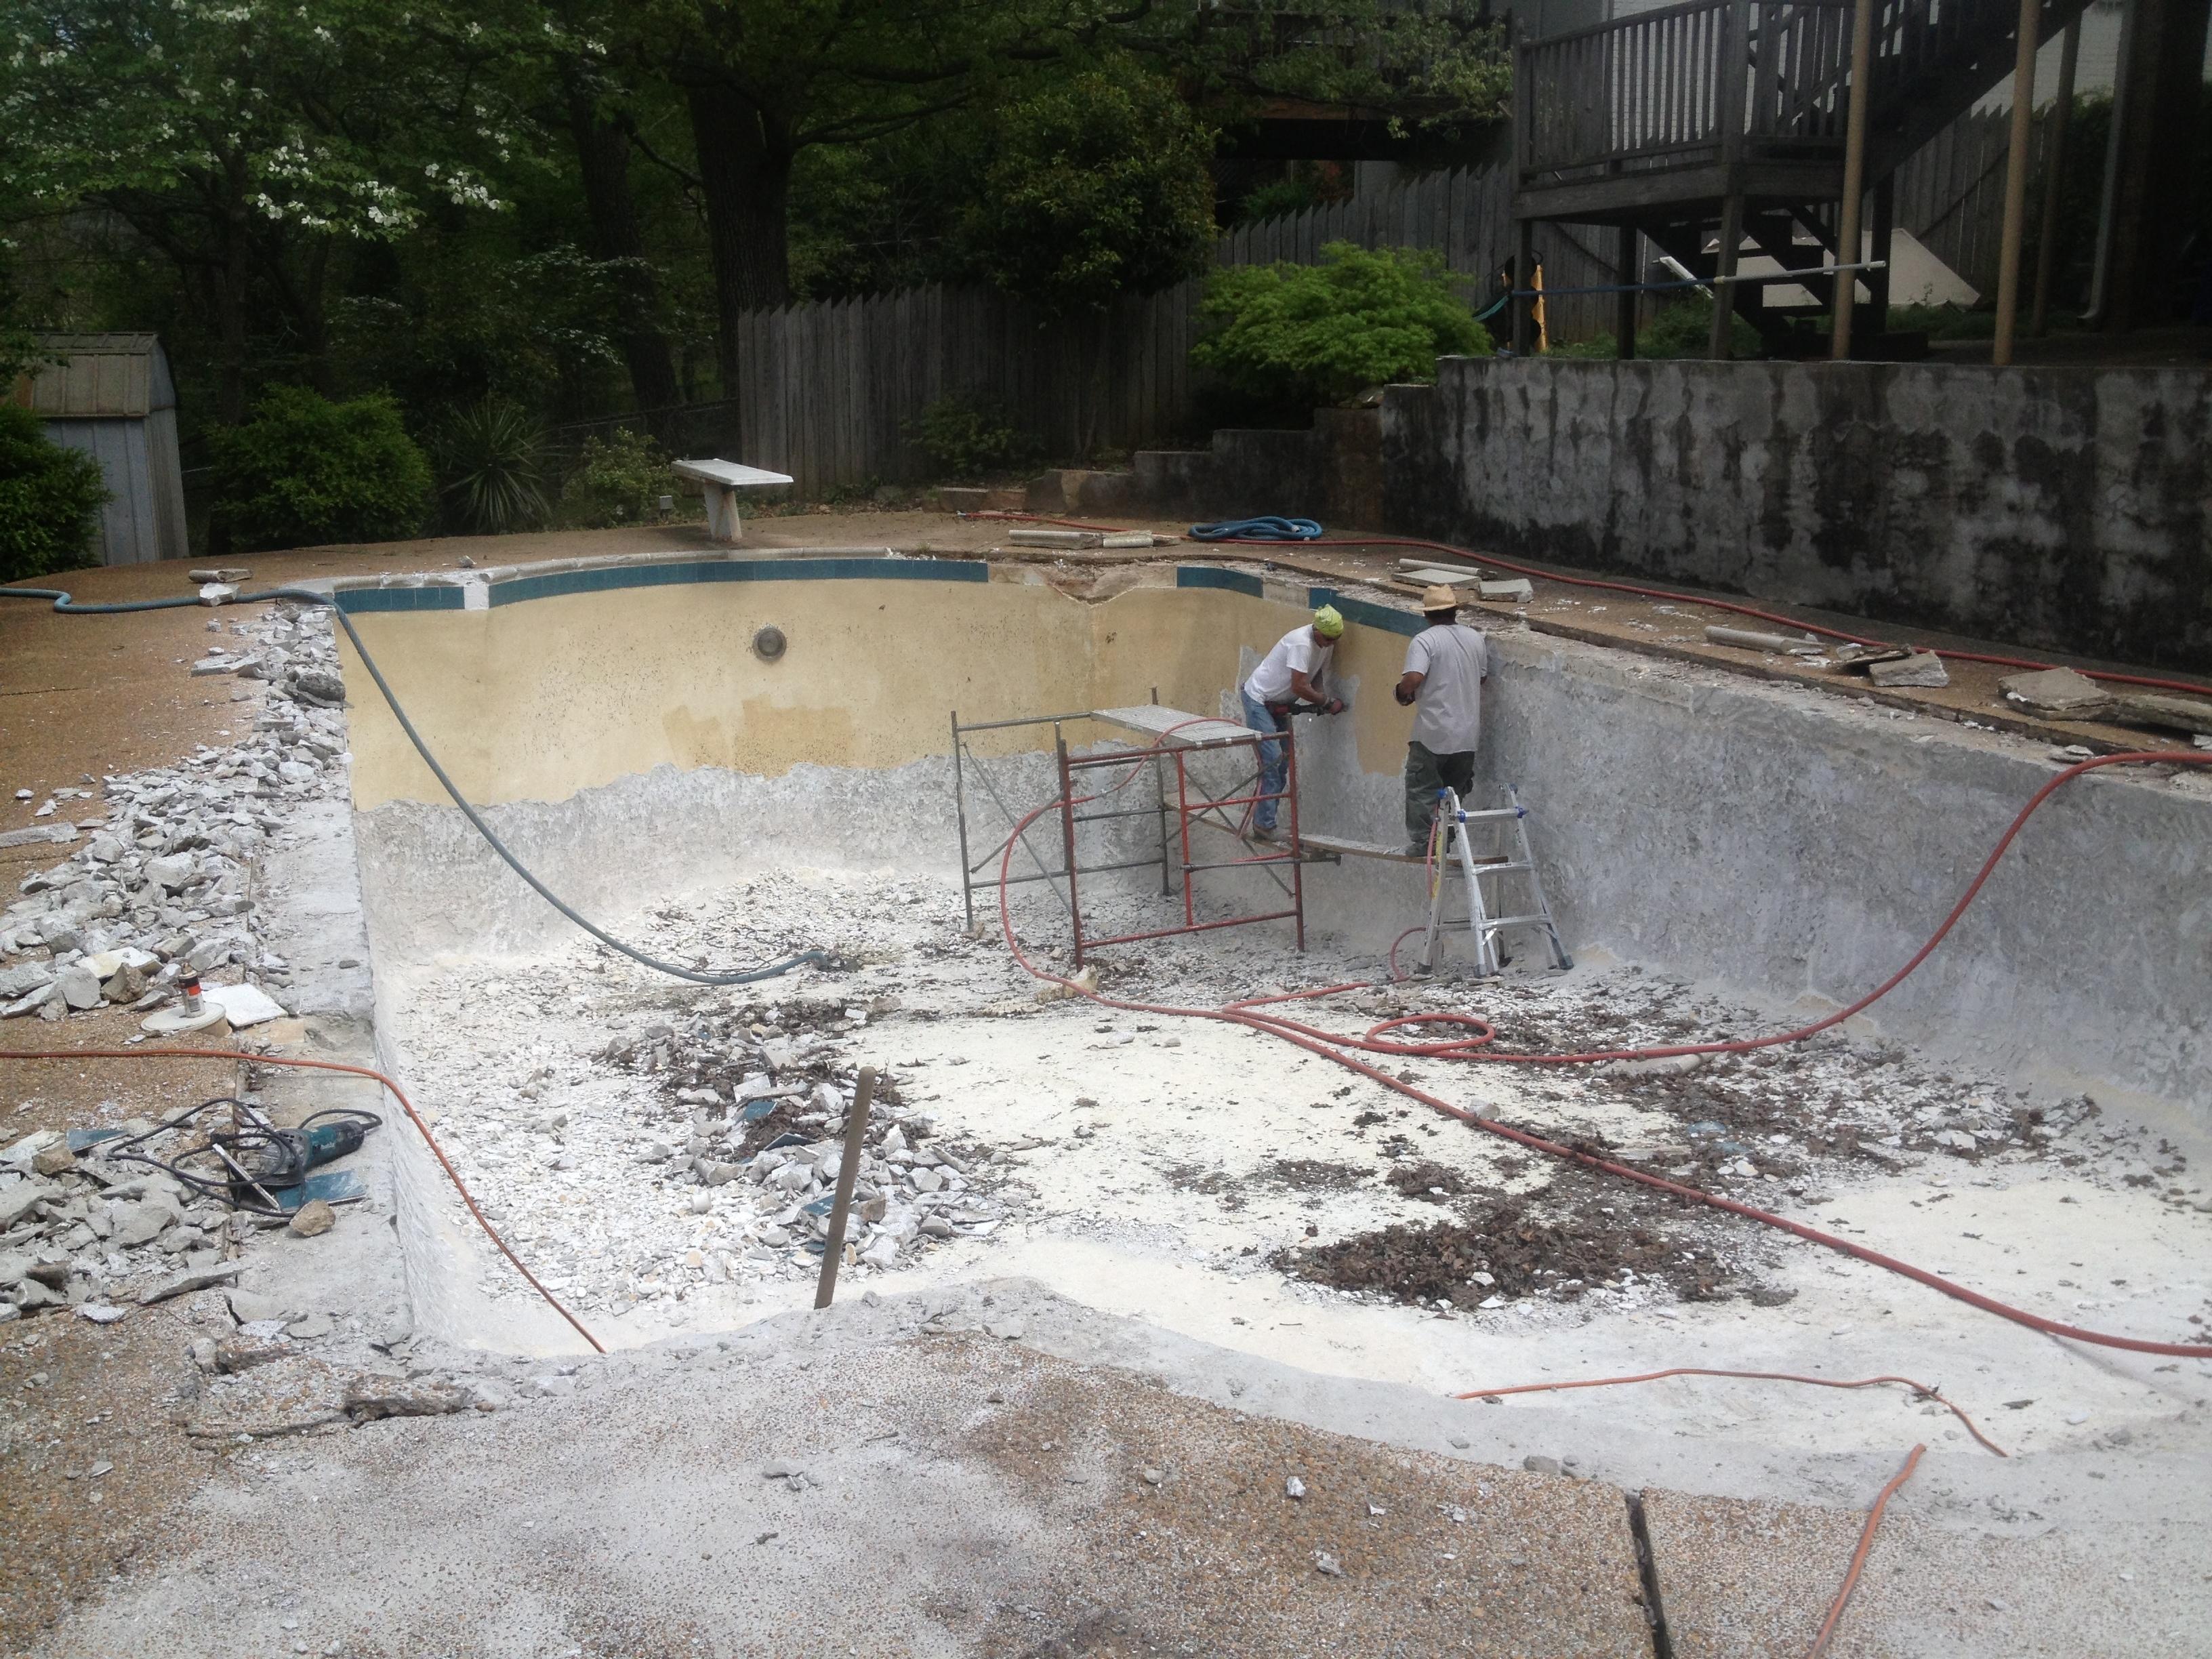 Mancha Hardscapes Pools  and  Spas image 15